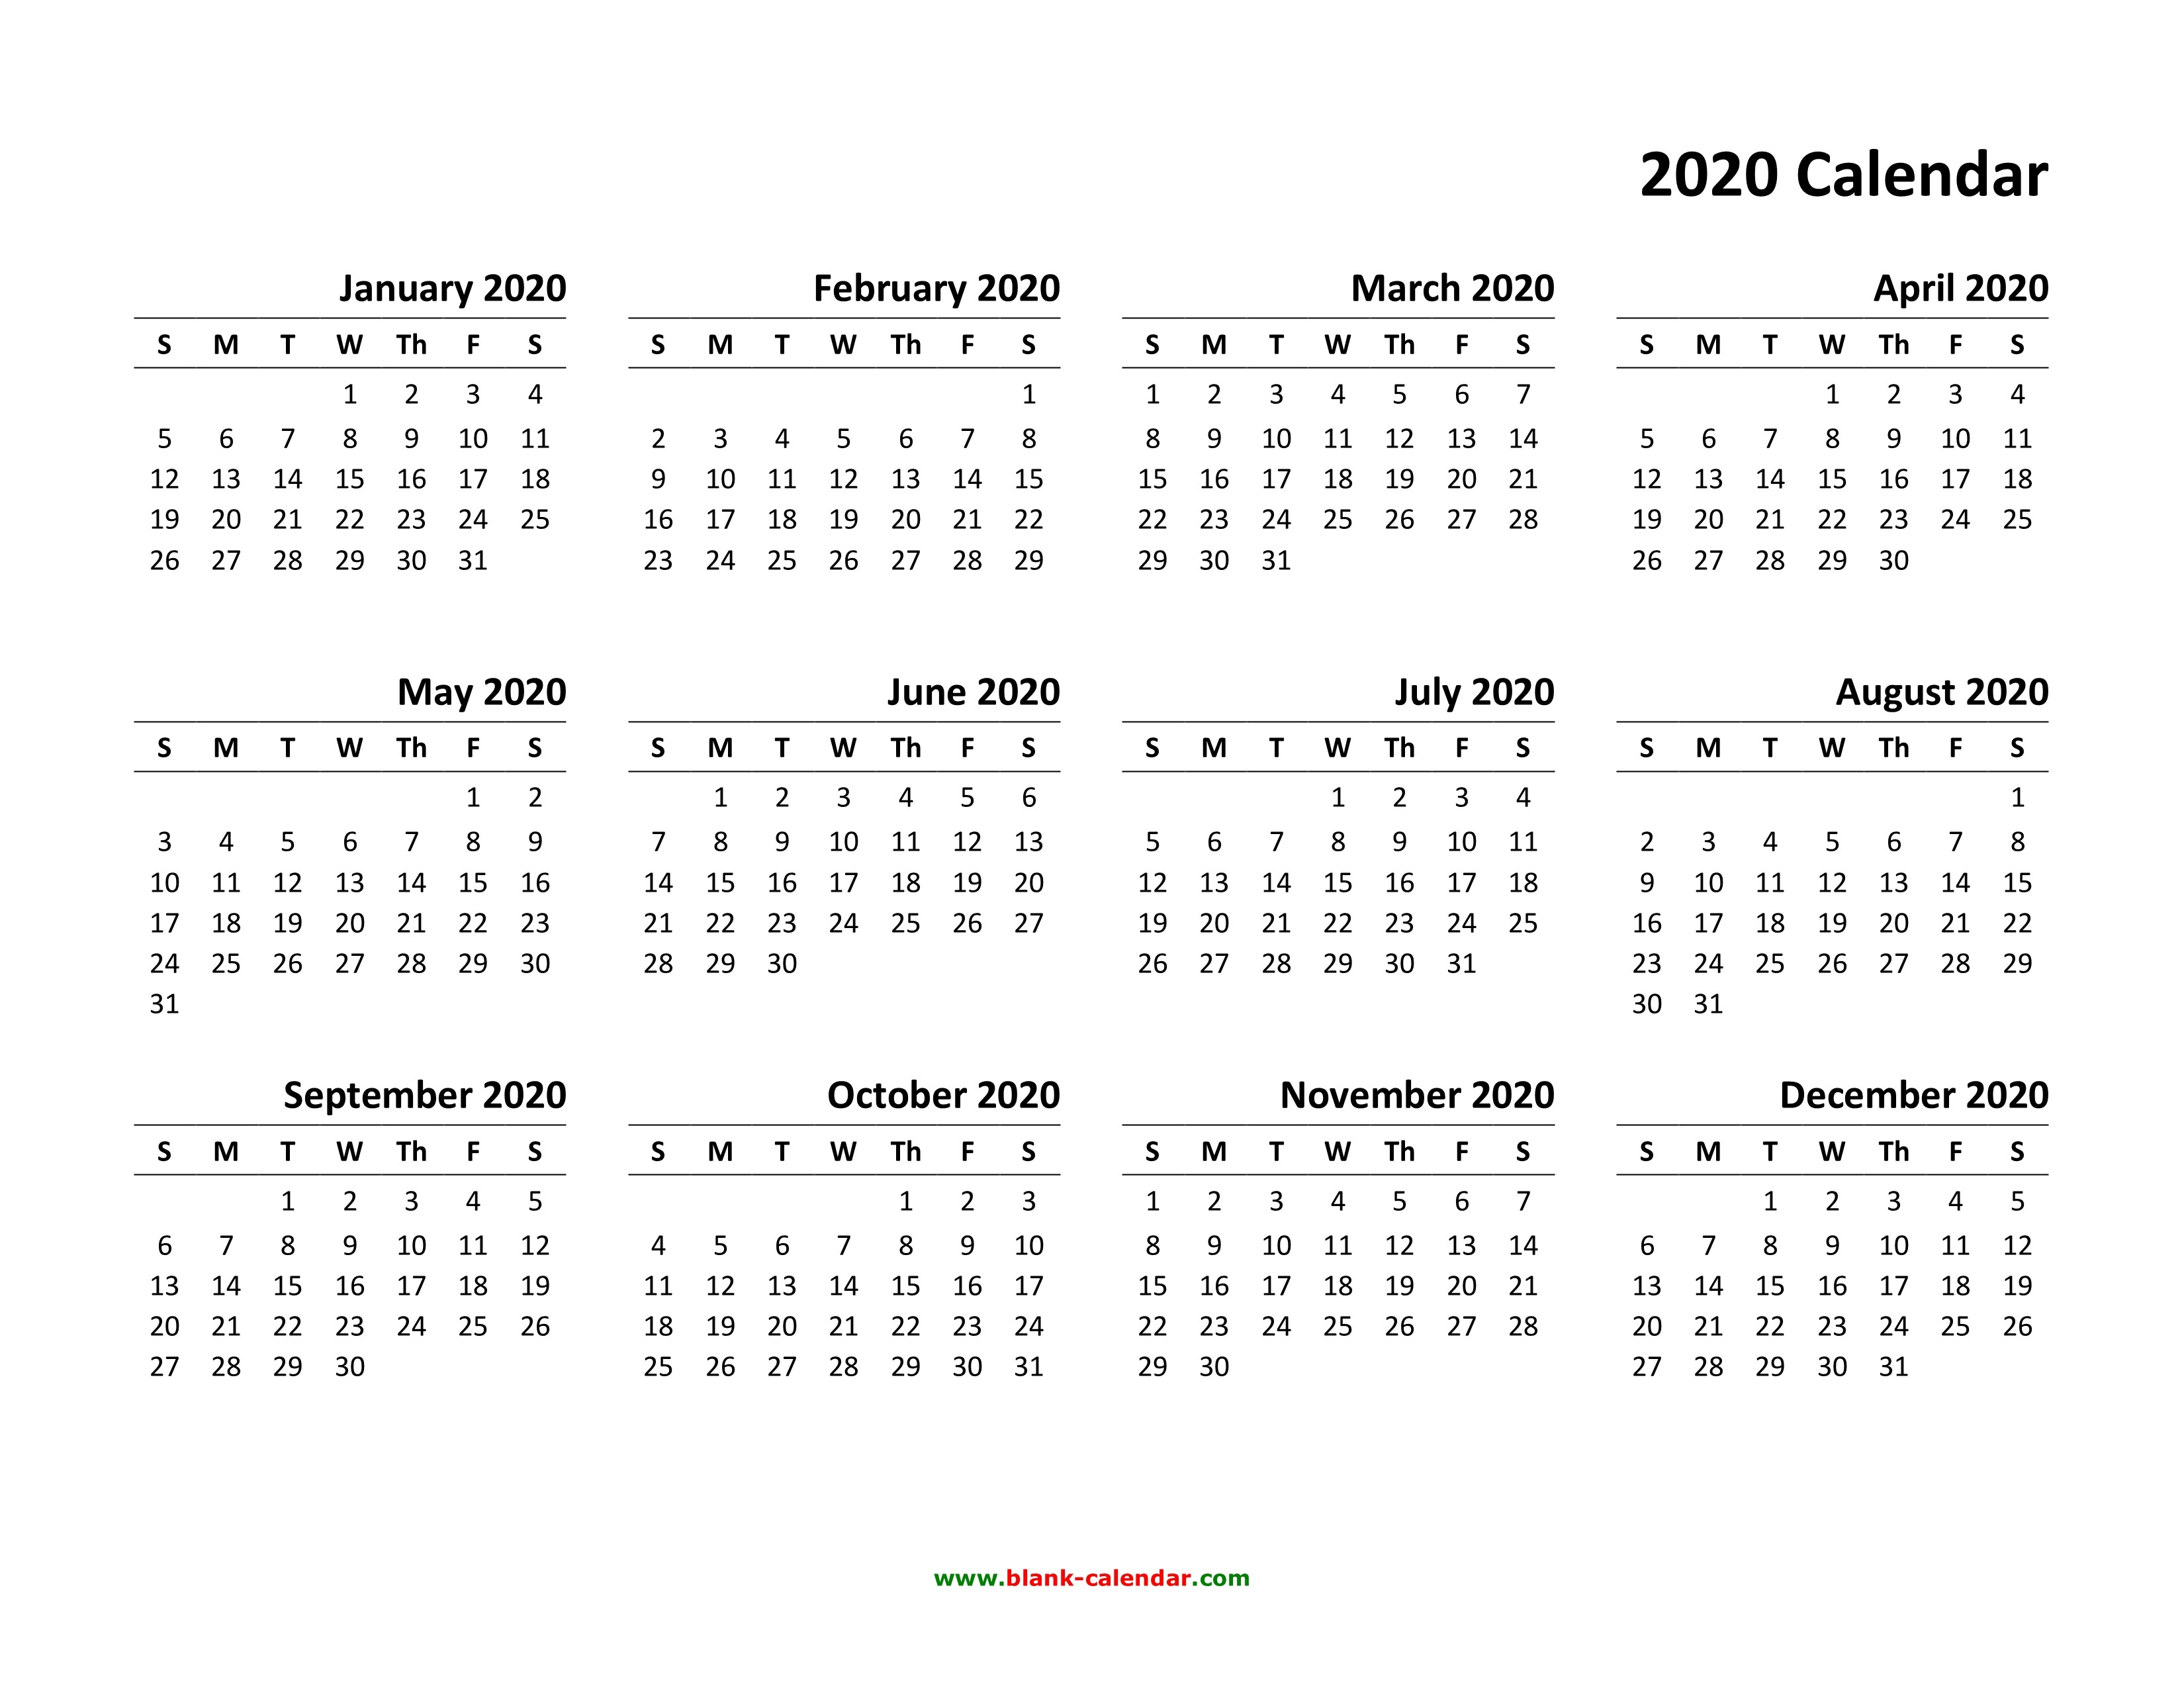 2020 Calendar Template Printable Yearly Calendar 2020